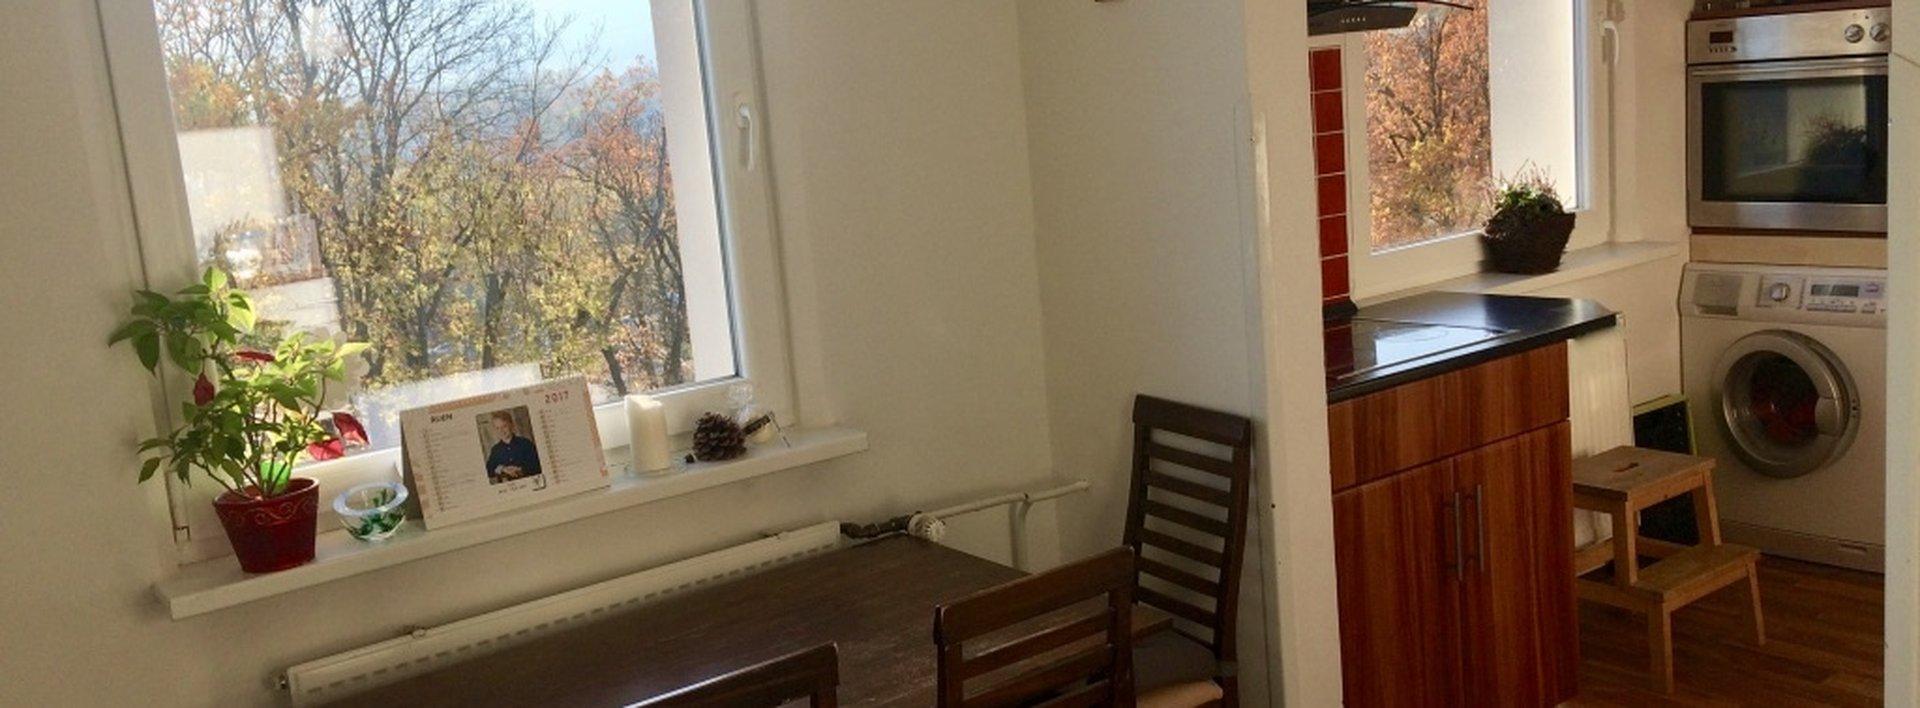 Prodej bytu 4+1 s lodžií, 95m² - Liberec, Vesec, ul. Kašparova, Ev.č.: N48235